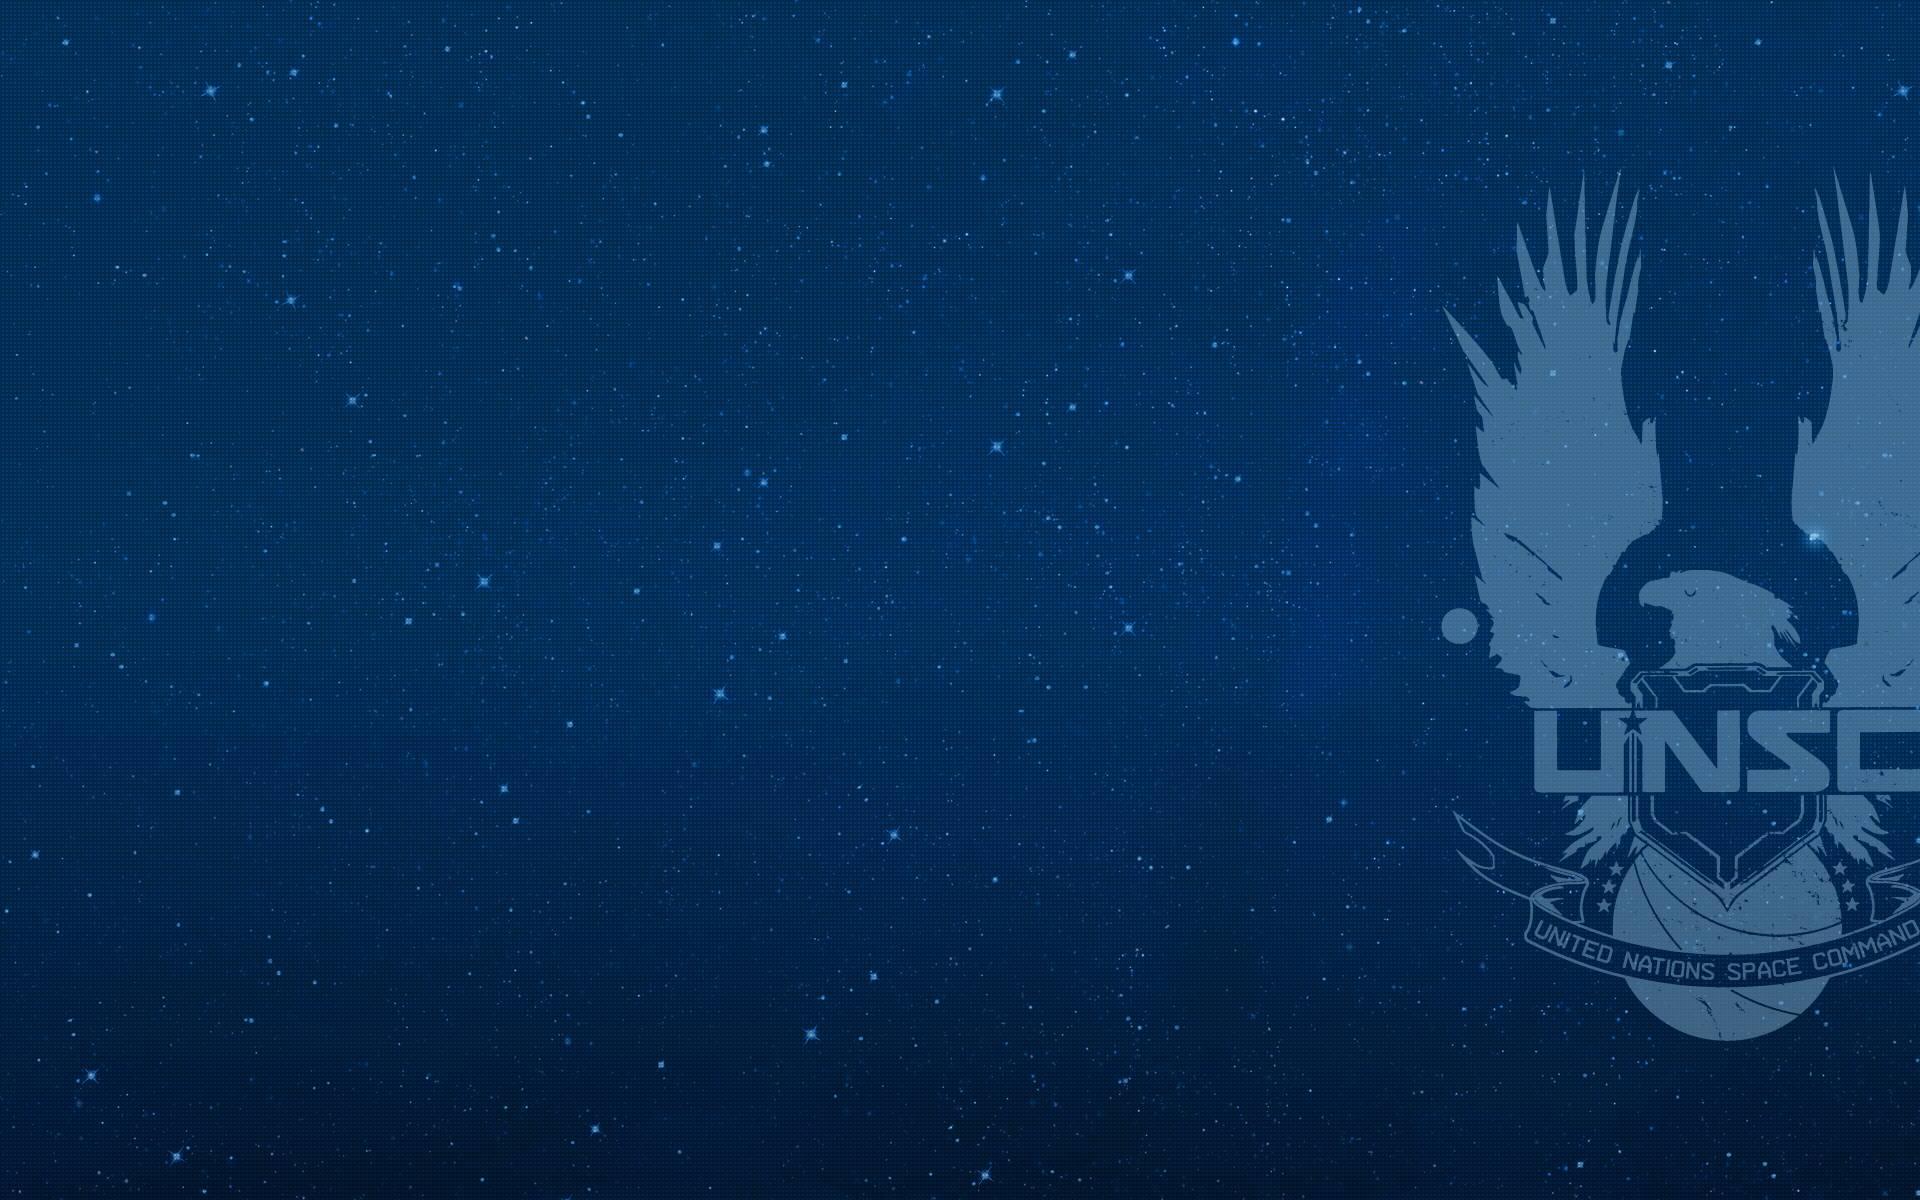 Halo Infinite Wallpapers Top Free Halo Infinite